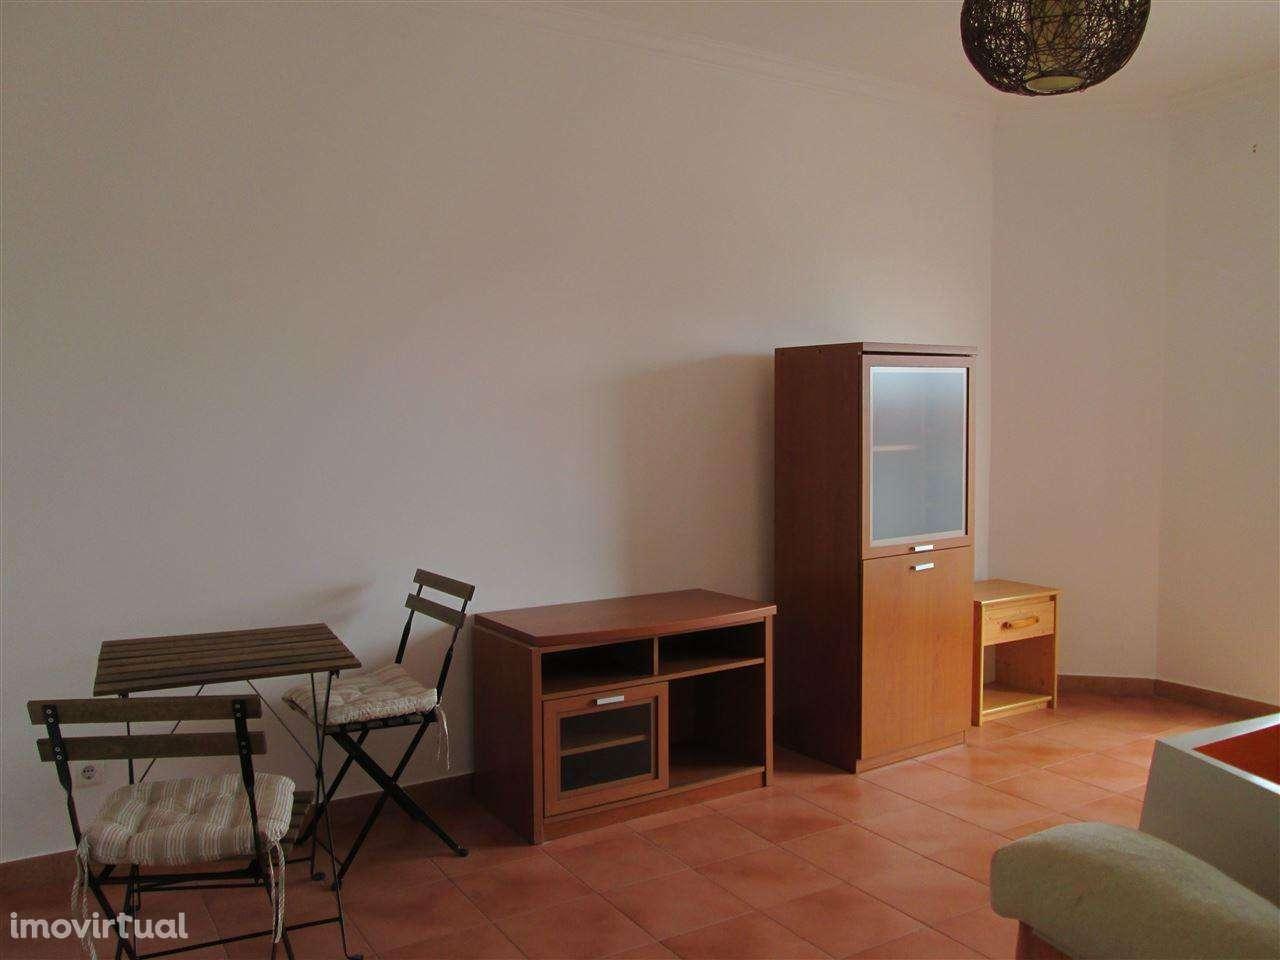 Apartamento para comprar, Ericeira, Mafra, Lisboa - Foto 5